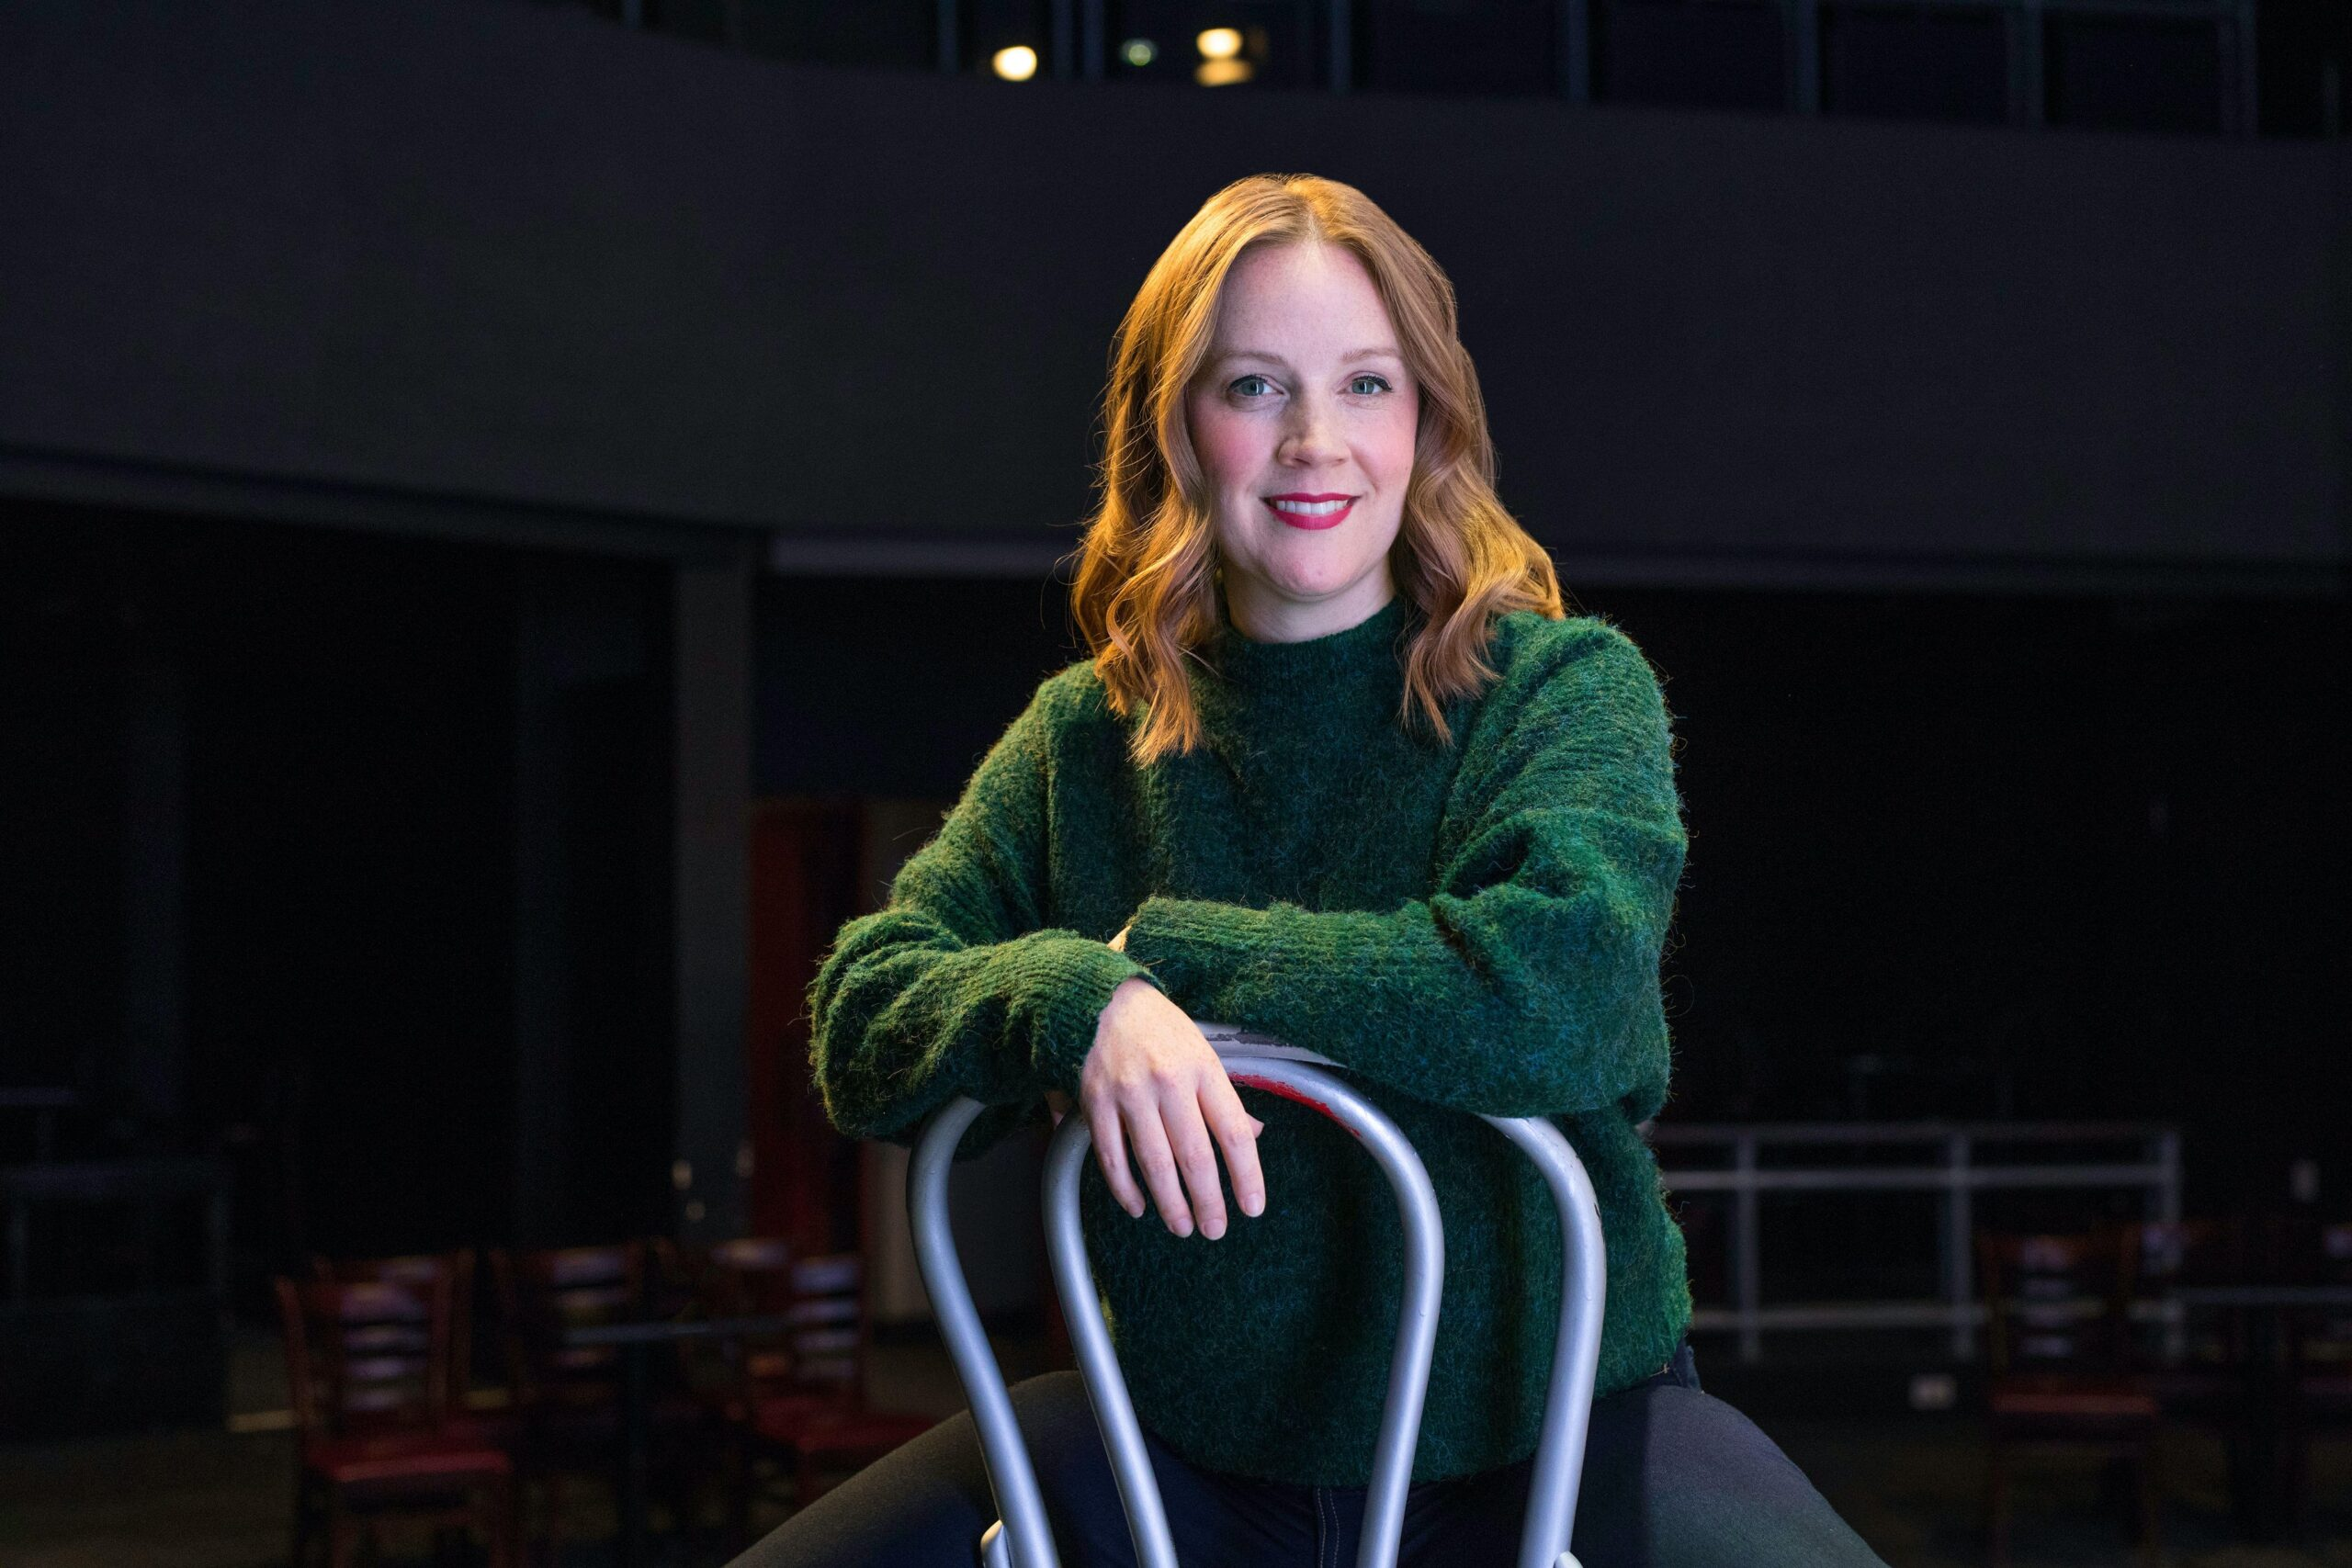 Natalie Metcalfe unmasks new Second City show